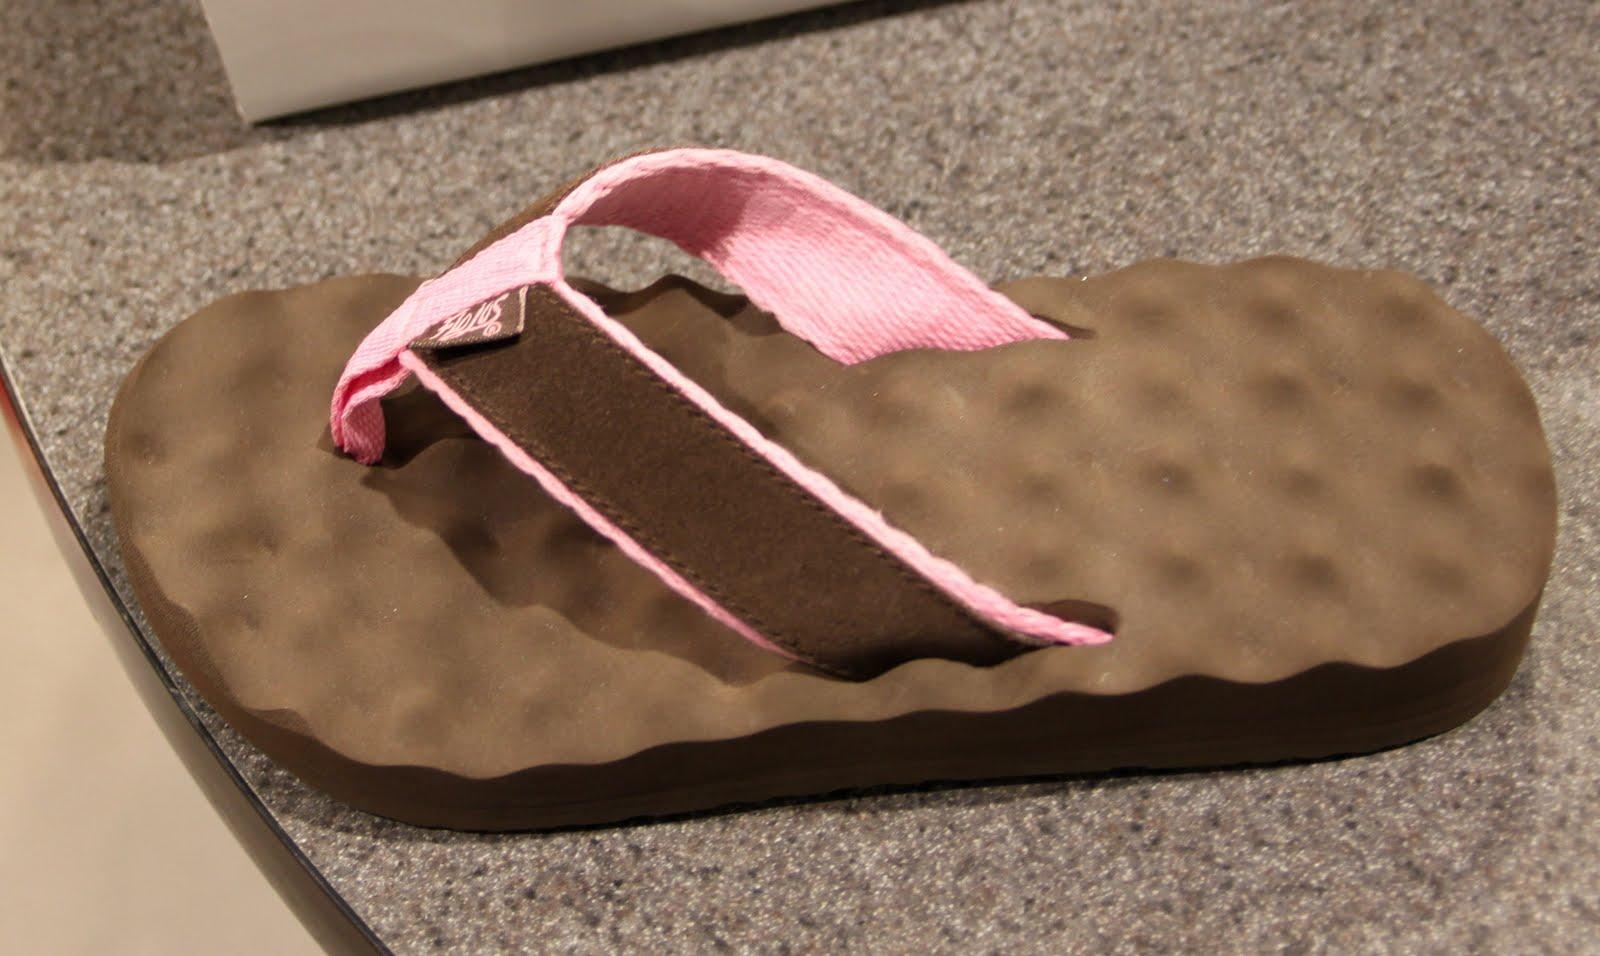 XENA $31 waffle/egg crate flip flops